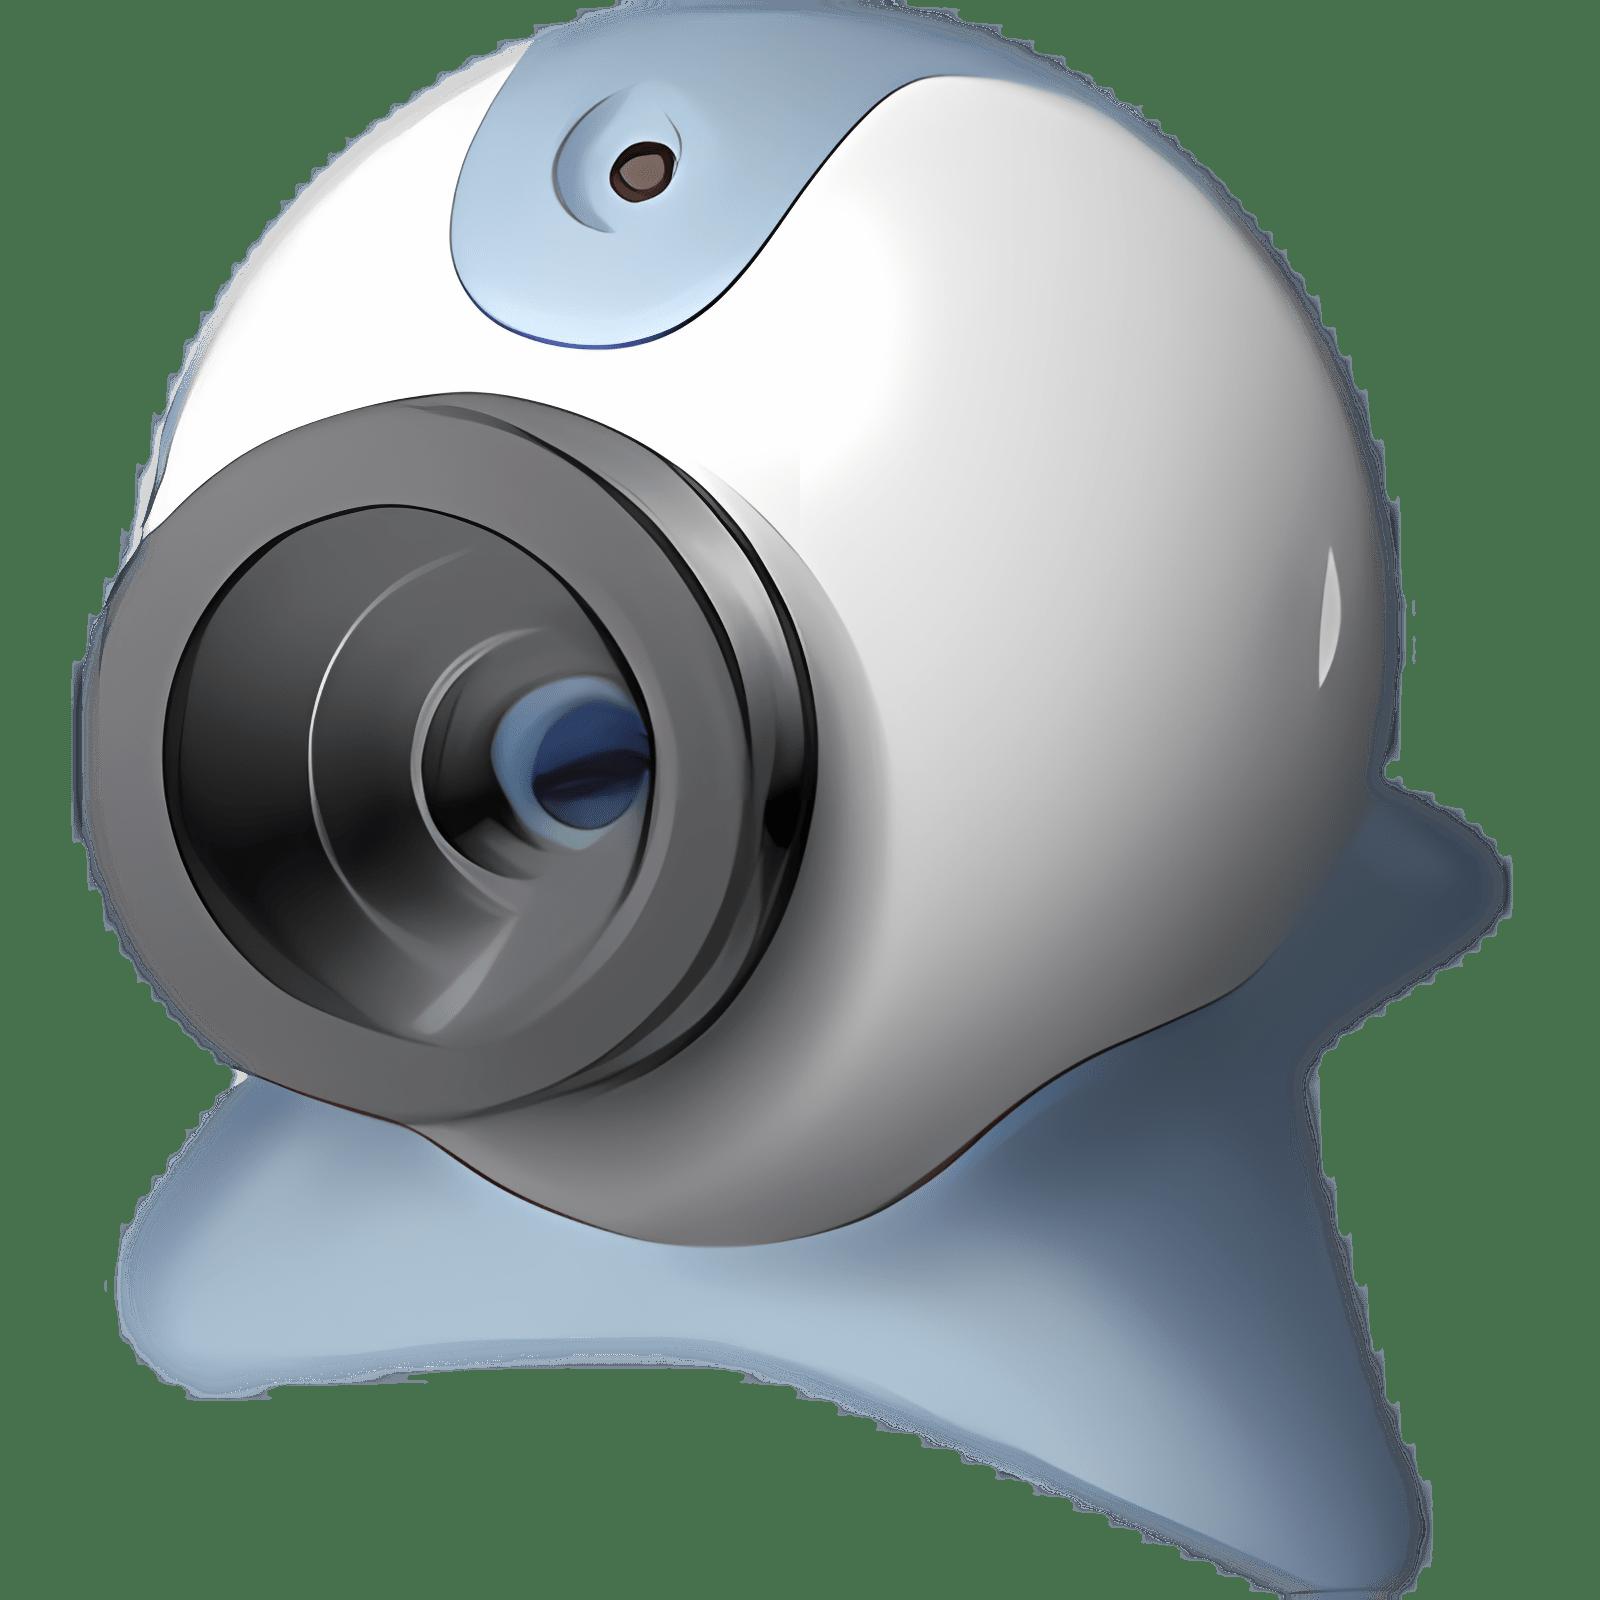 CamDVR 2.4.2.0